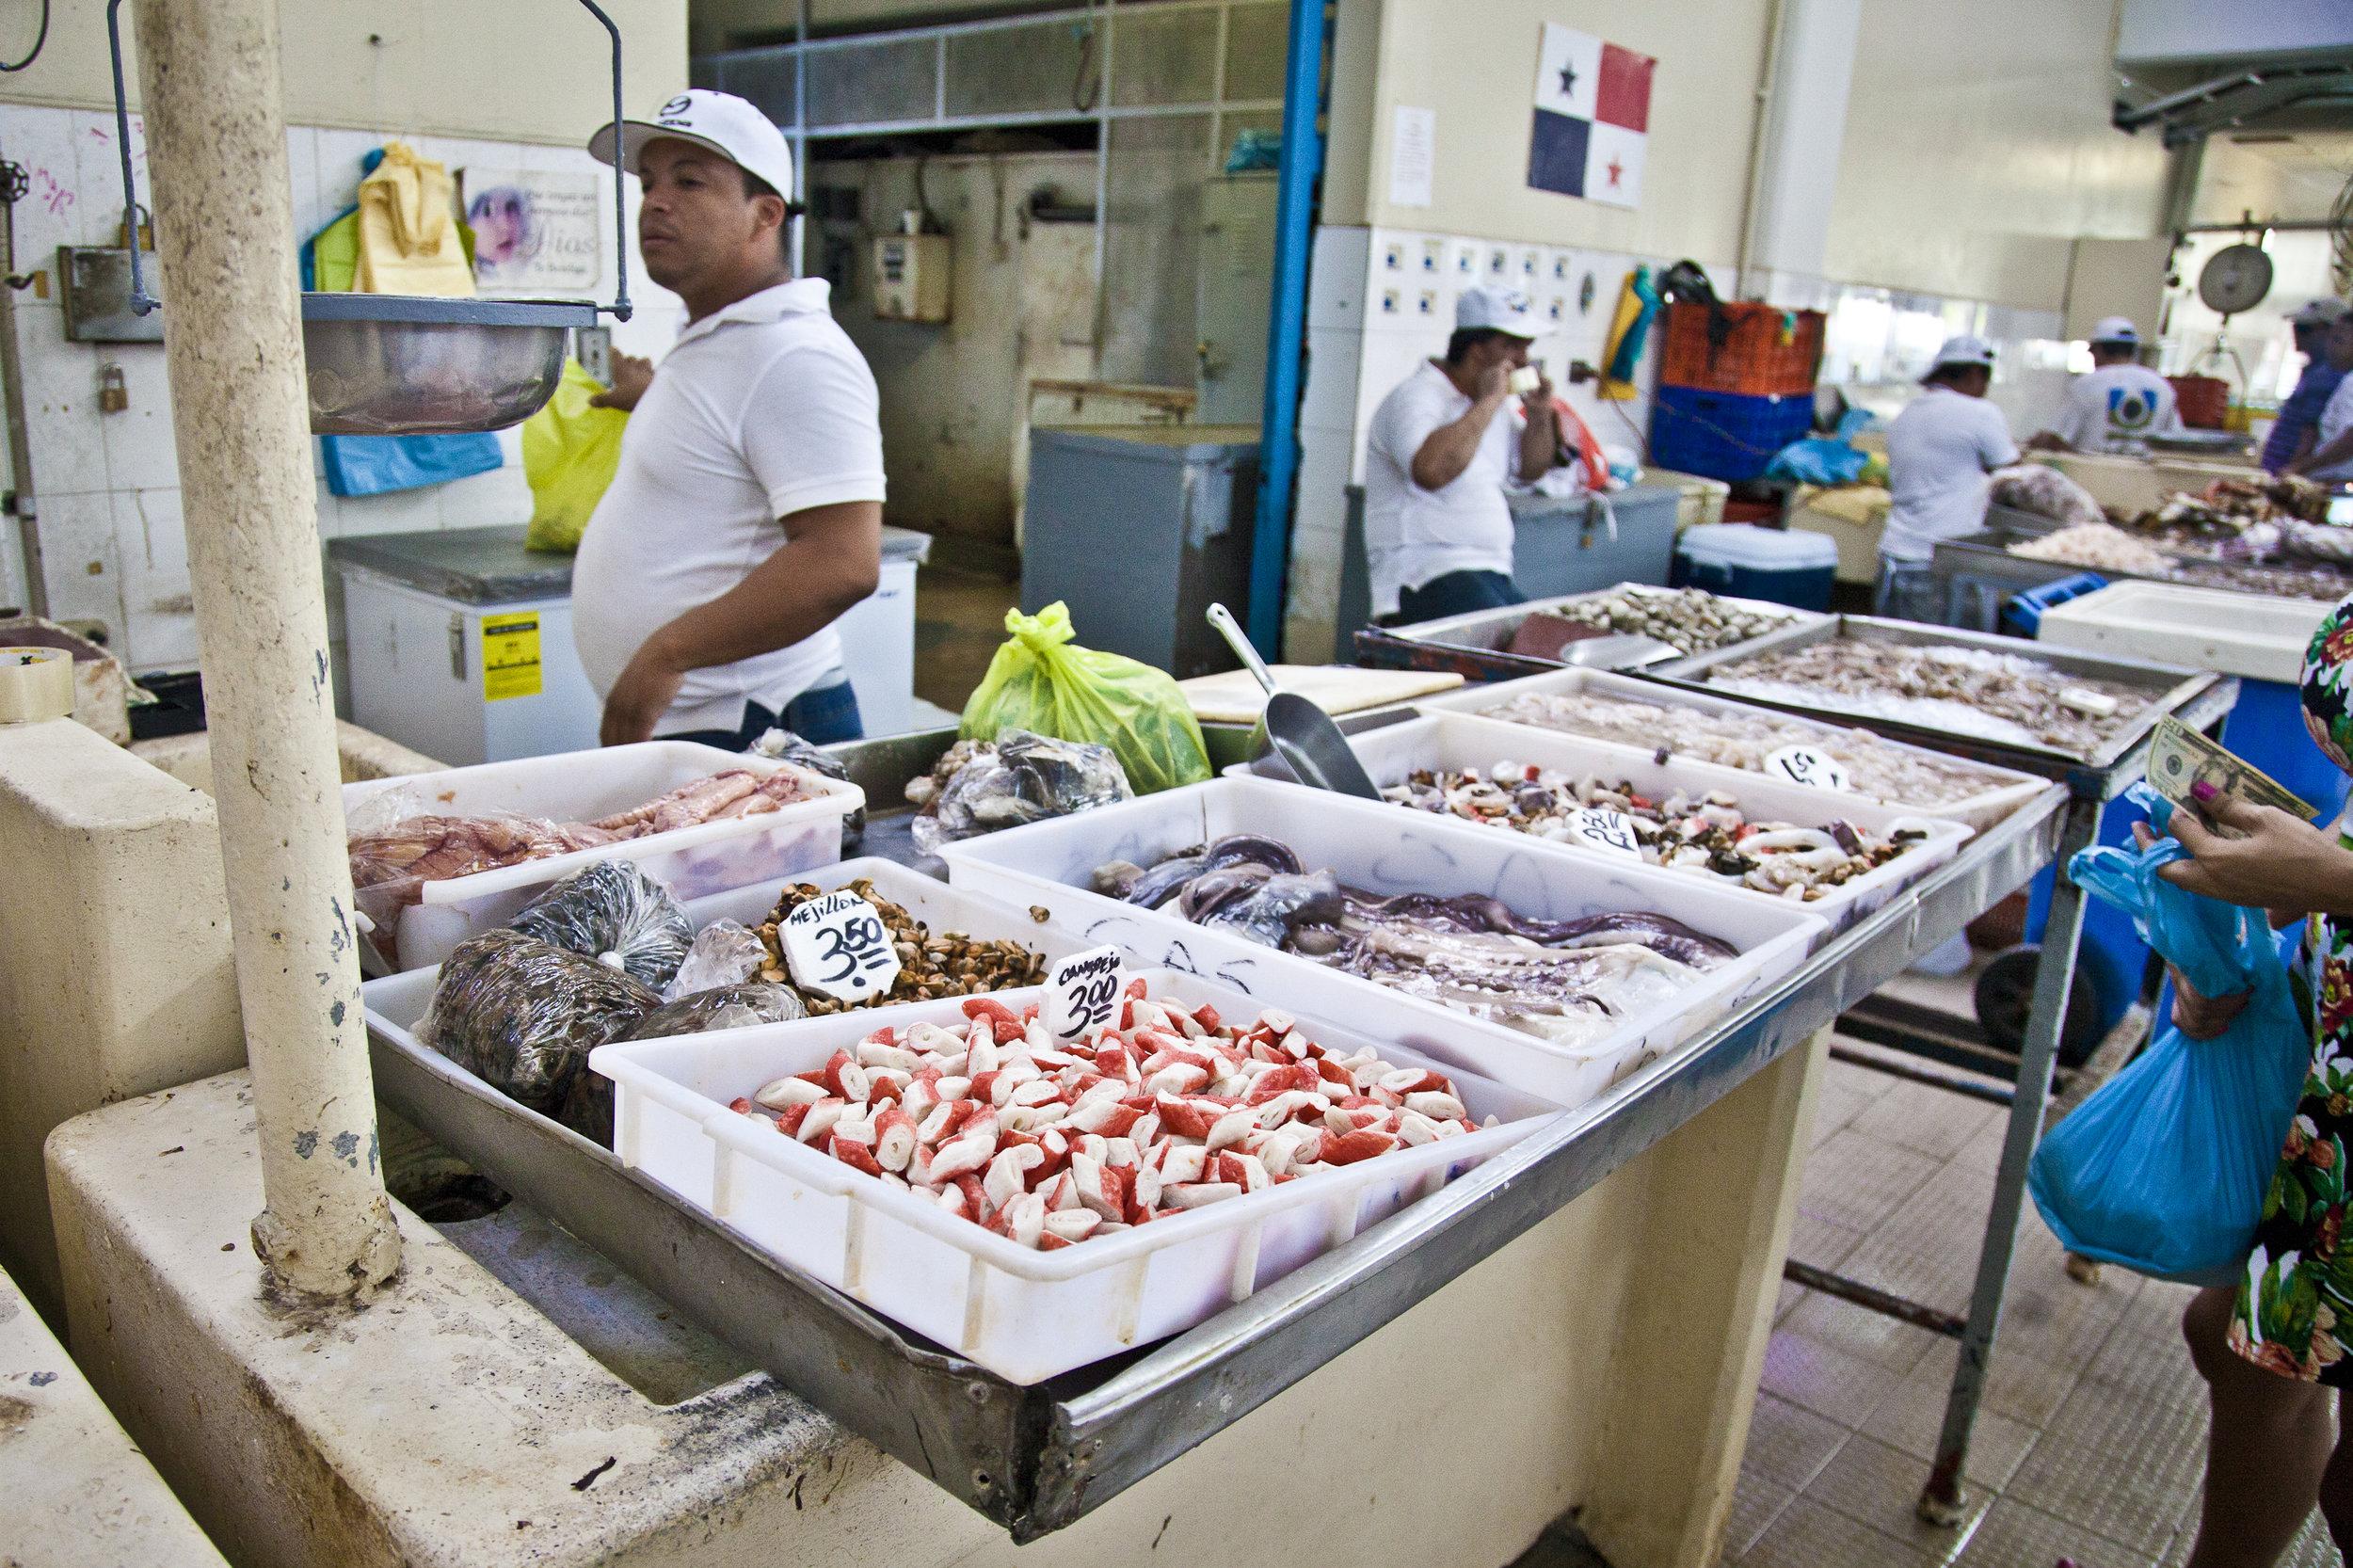 Mercado de Mariscos Panama - Across the Blue Planet